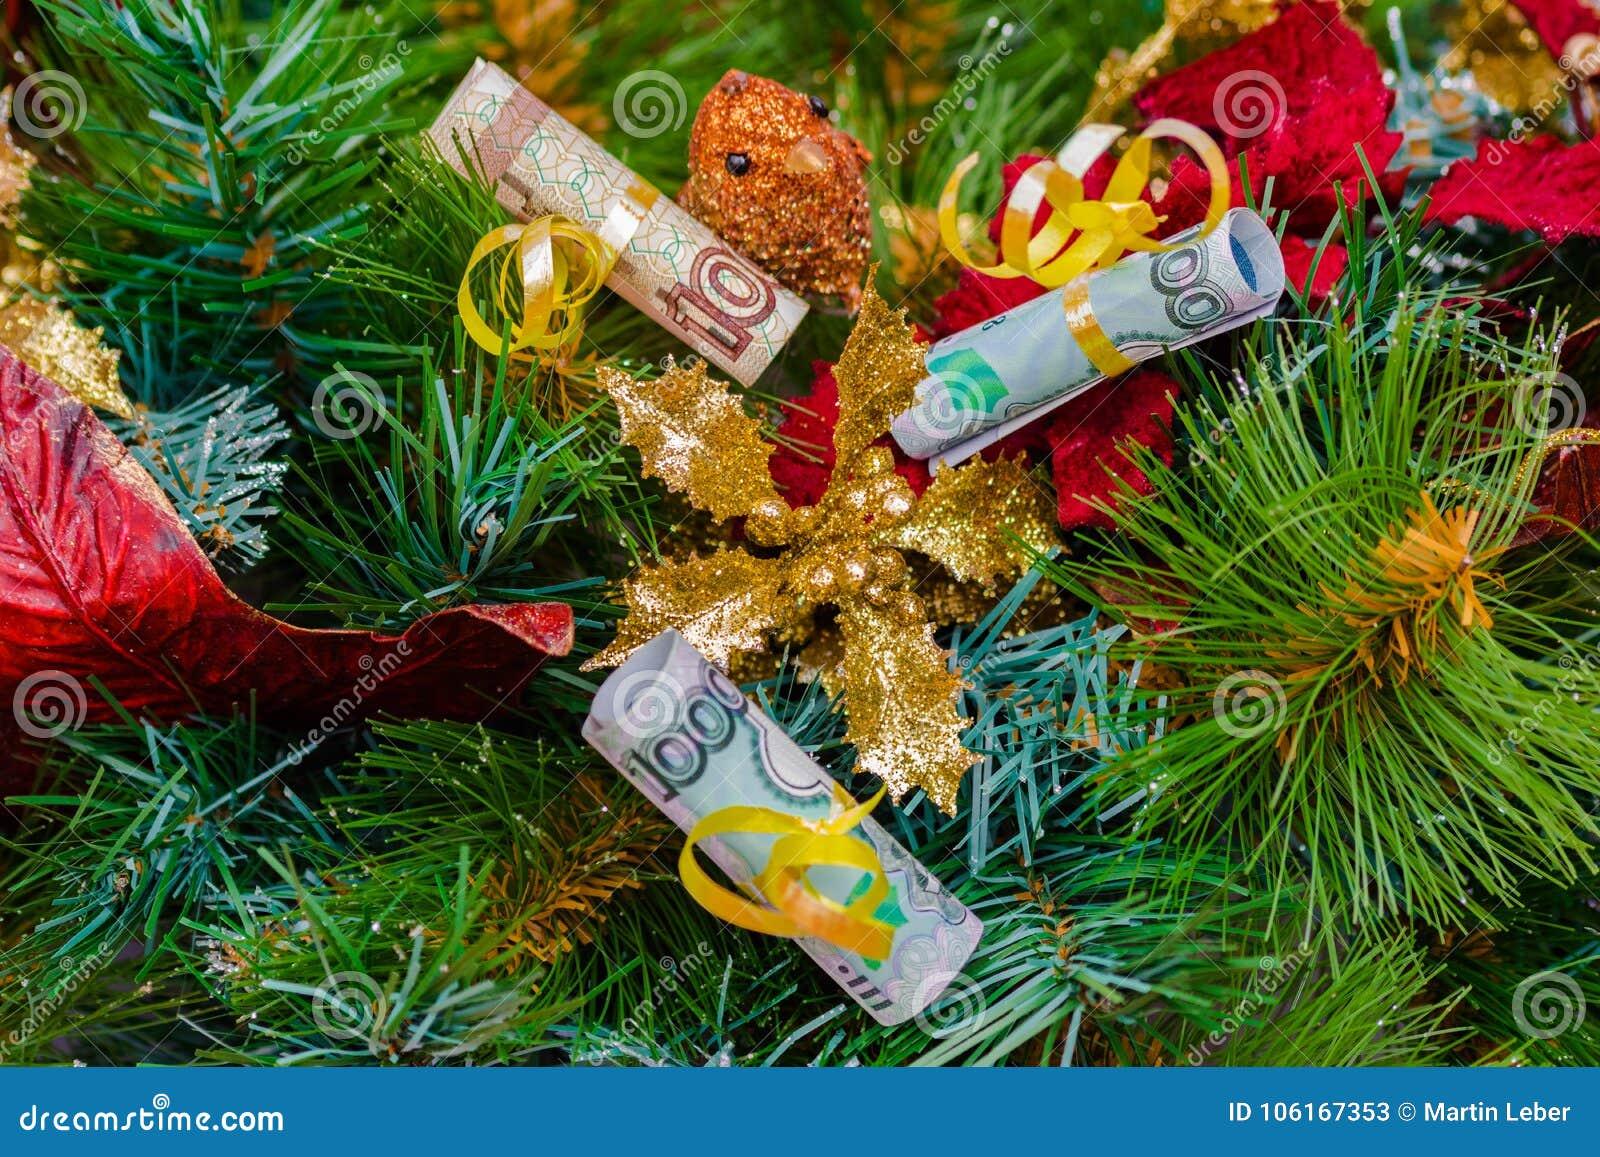 Christmas Tree Bill.Christmas Tree Russian Rubles Bills Decoration Stock Image